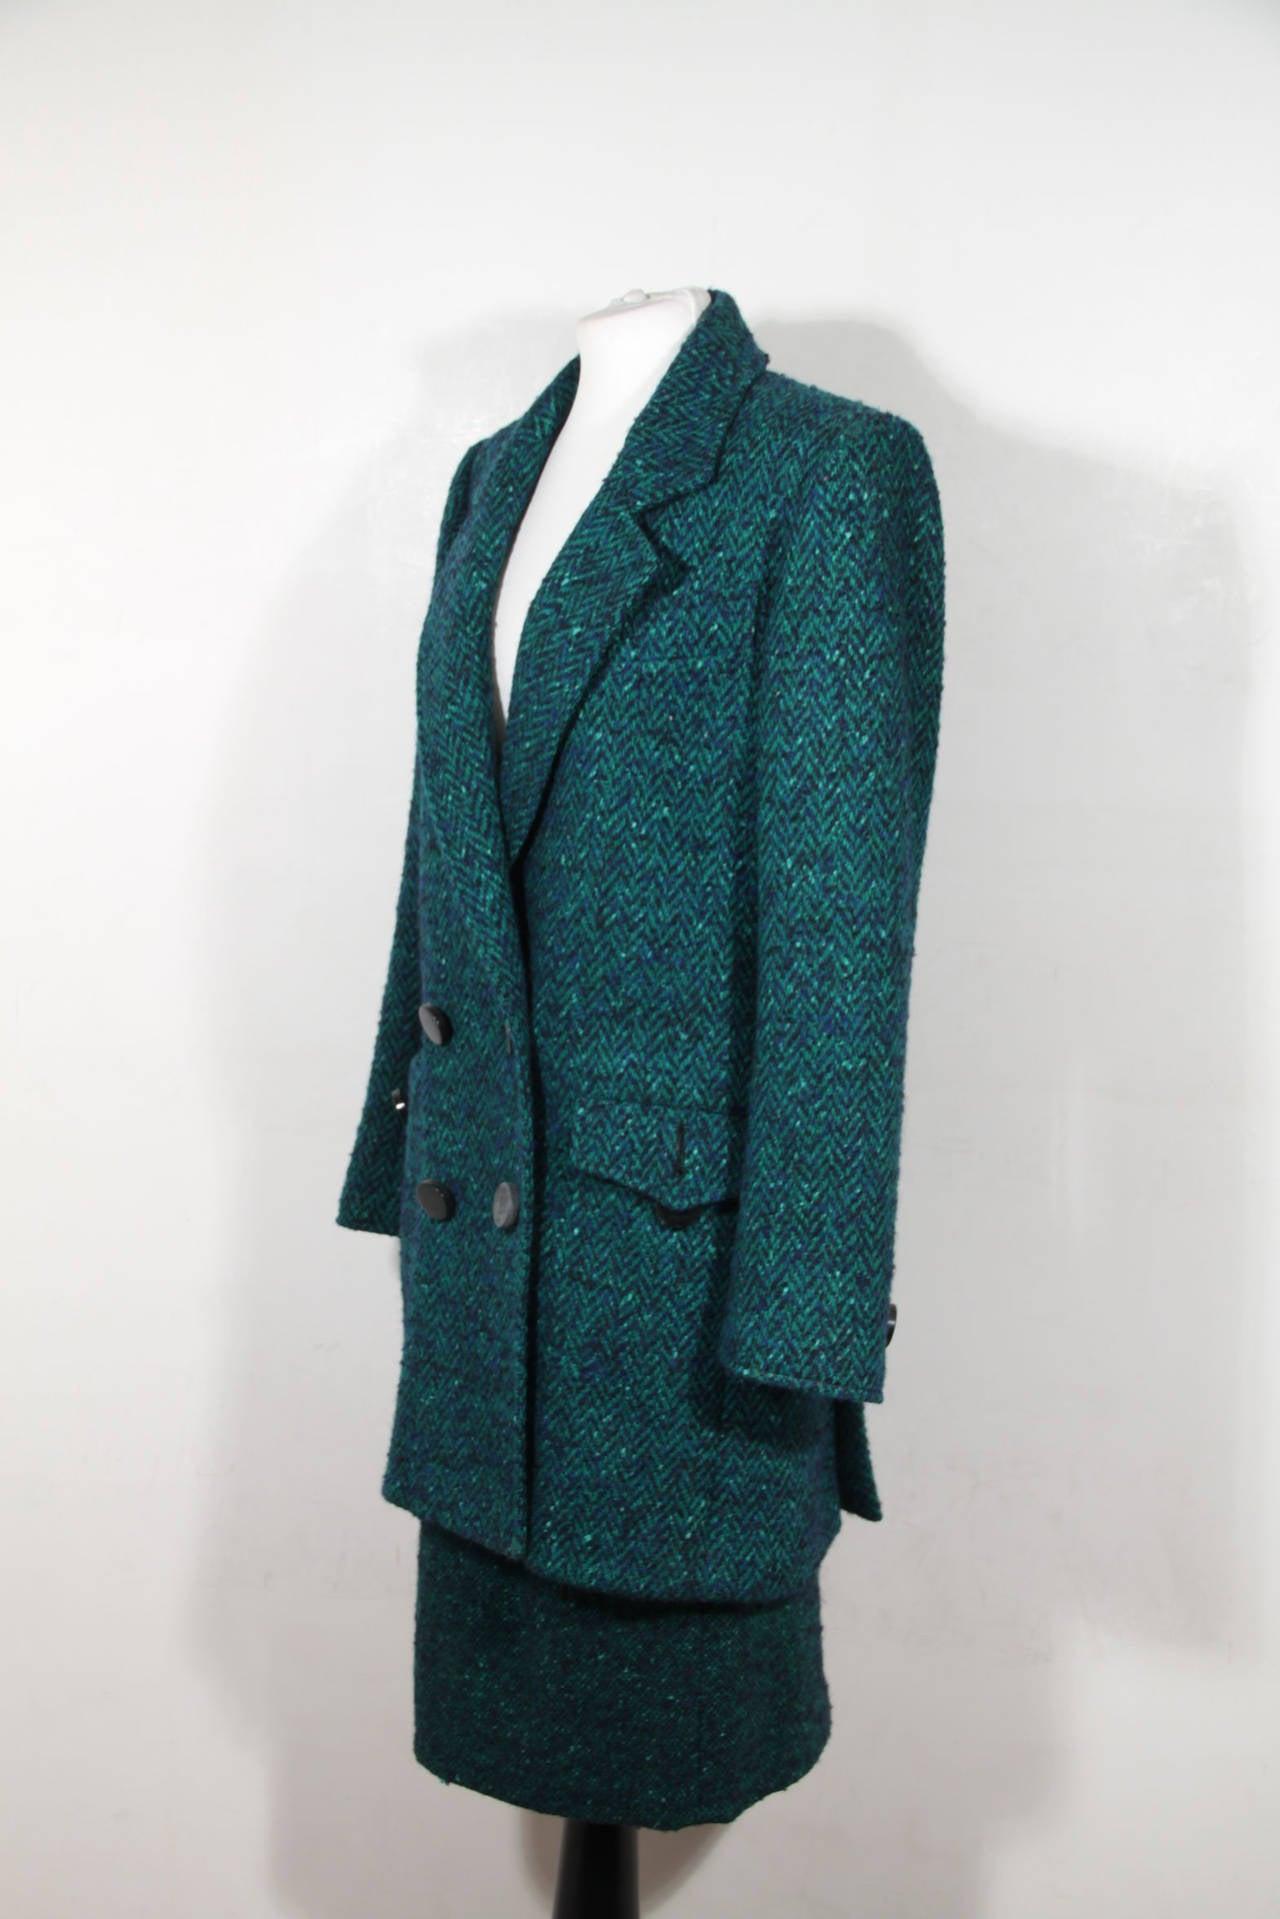 Black ANDREA ODICINI Italian VINTAGE Green Tweed SUIT Coat & Skirt SET Sz 40 IT For Sale